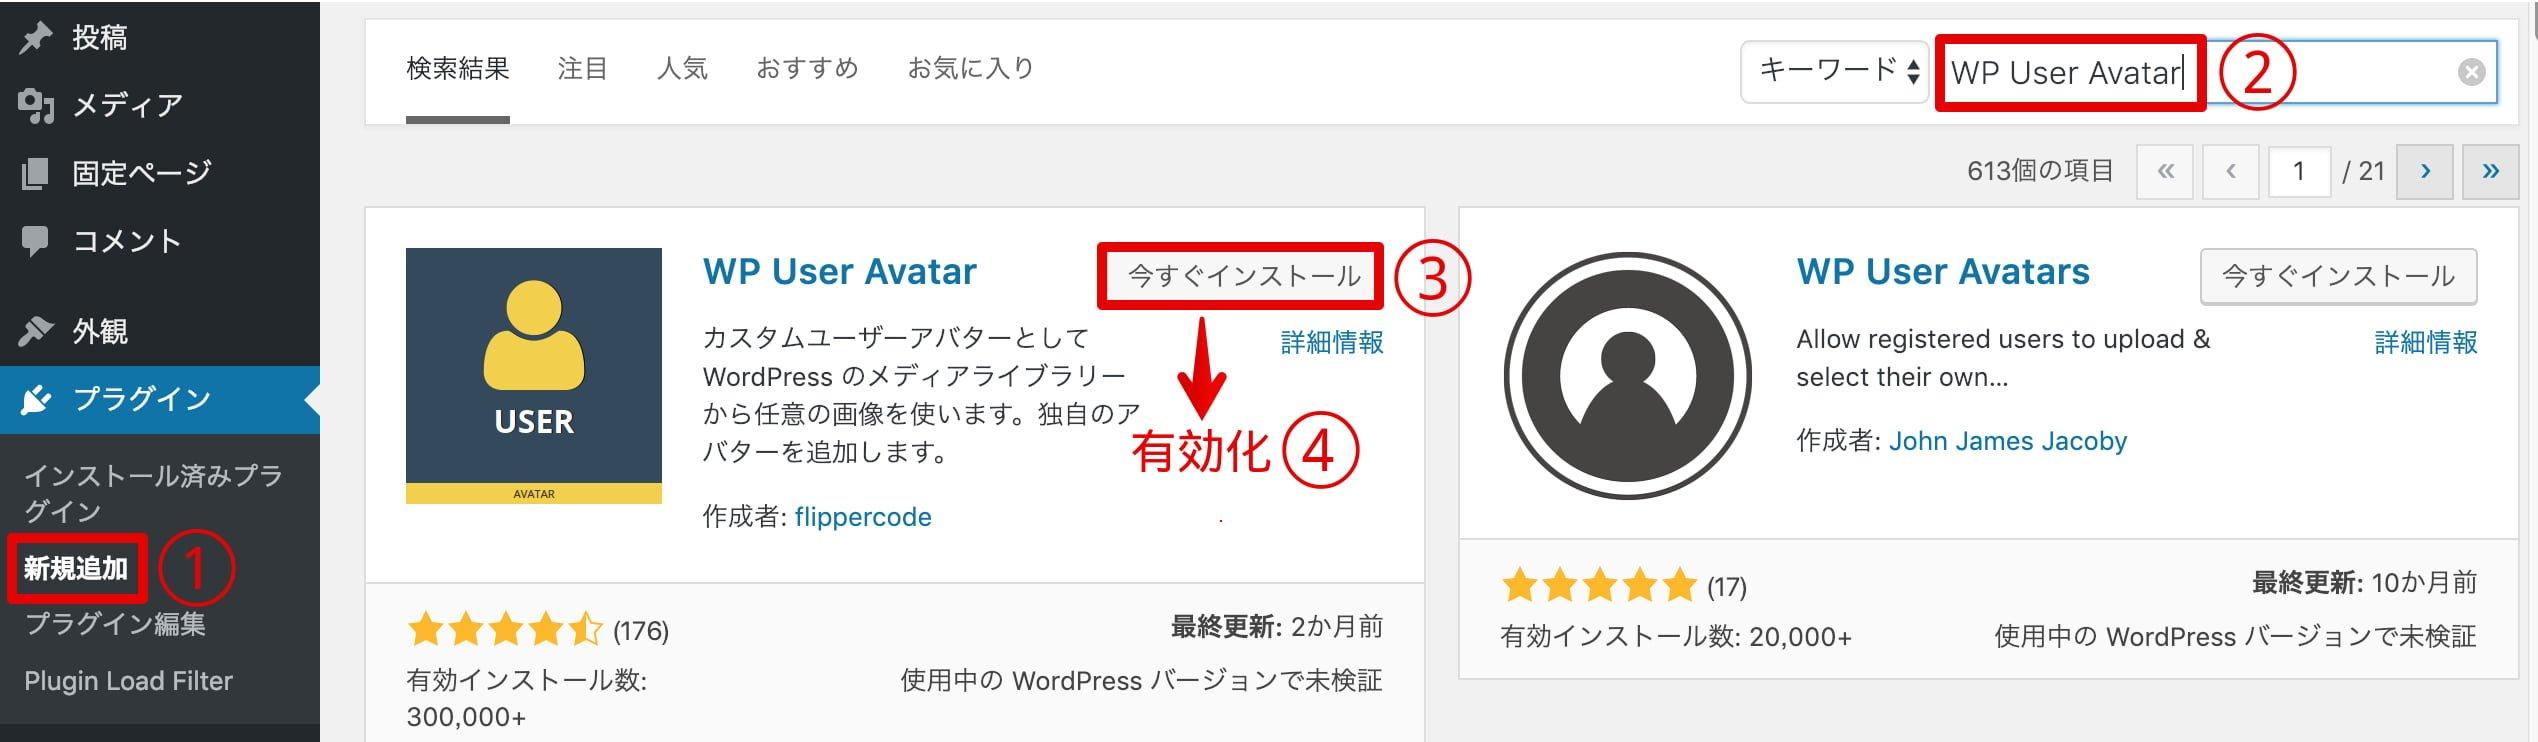 WP User Avatarインストール